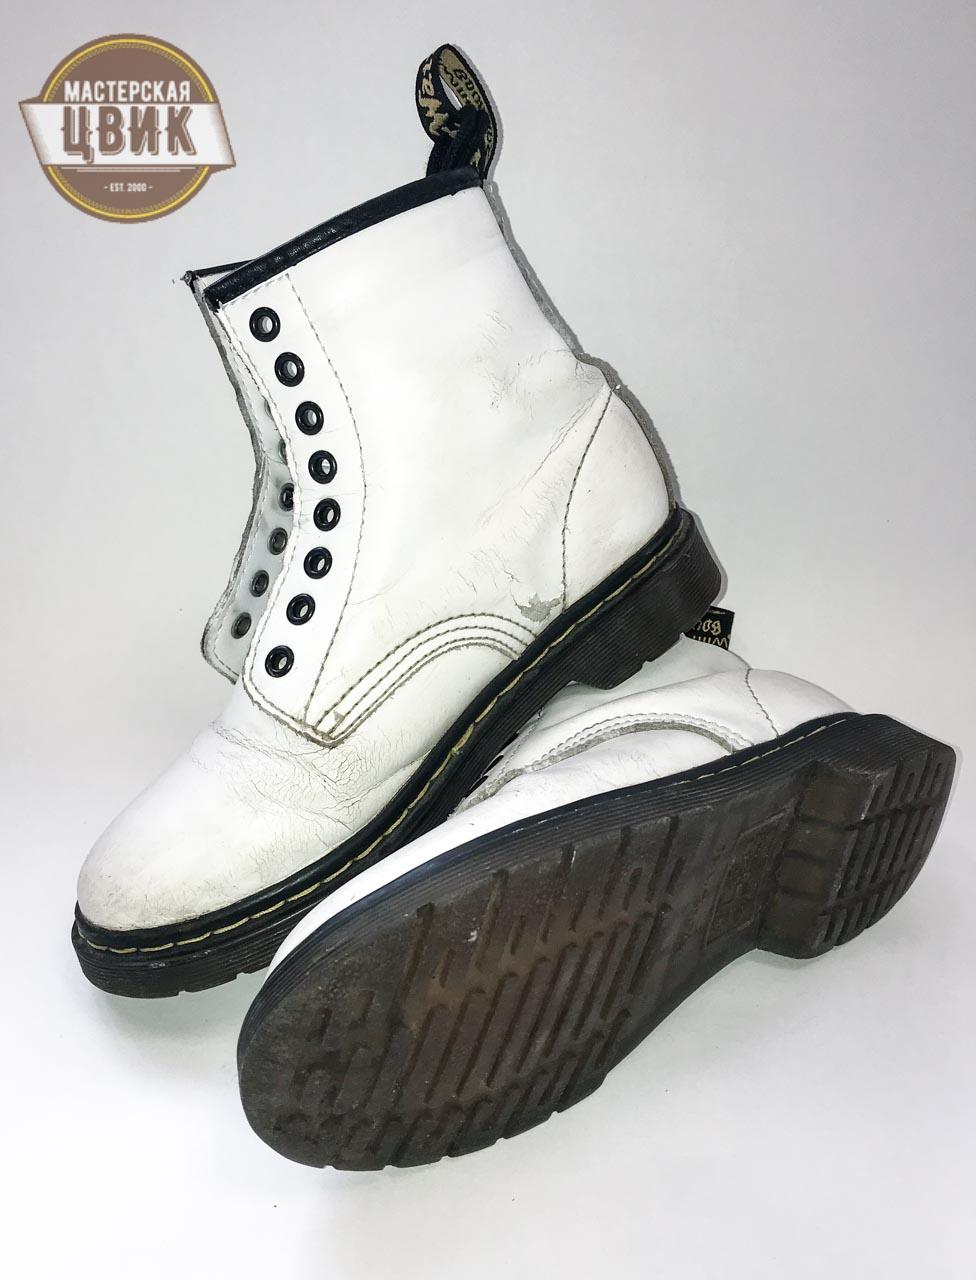 individualnyj-poshiv-obuvi-minsk-28 Индивидуальный пошив обуви Минск-28